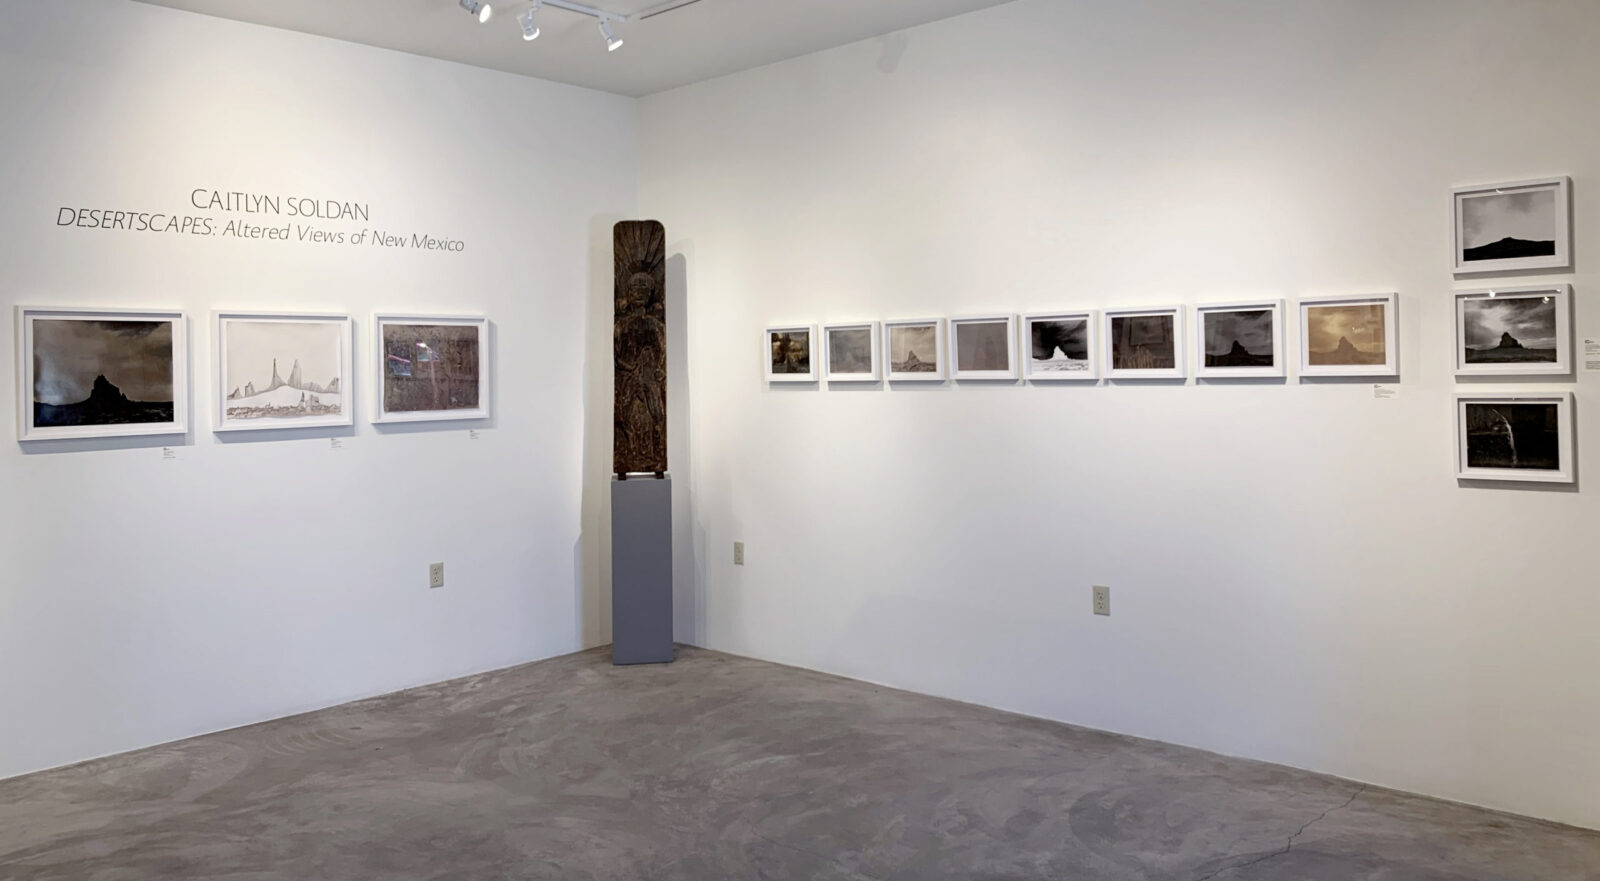 Installation image of Caitlyn Soldan's gallery exhibition